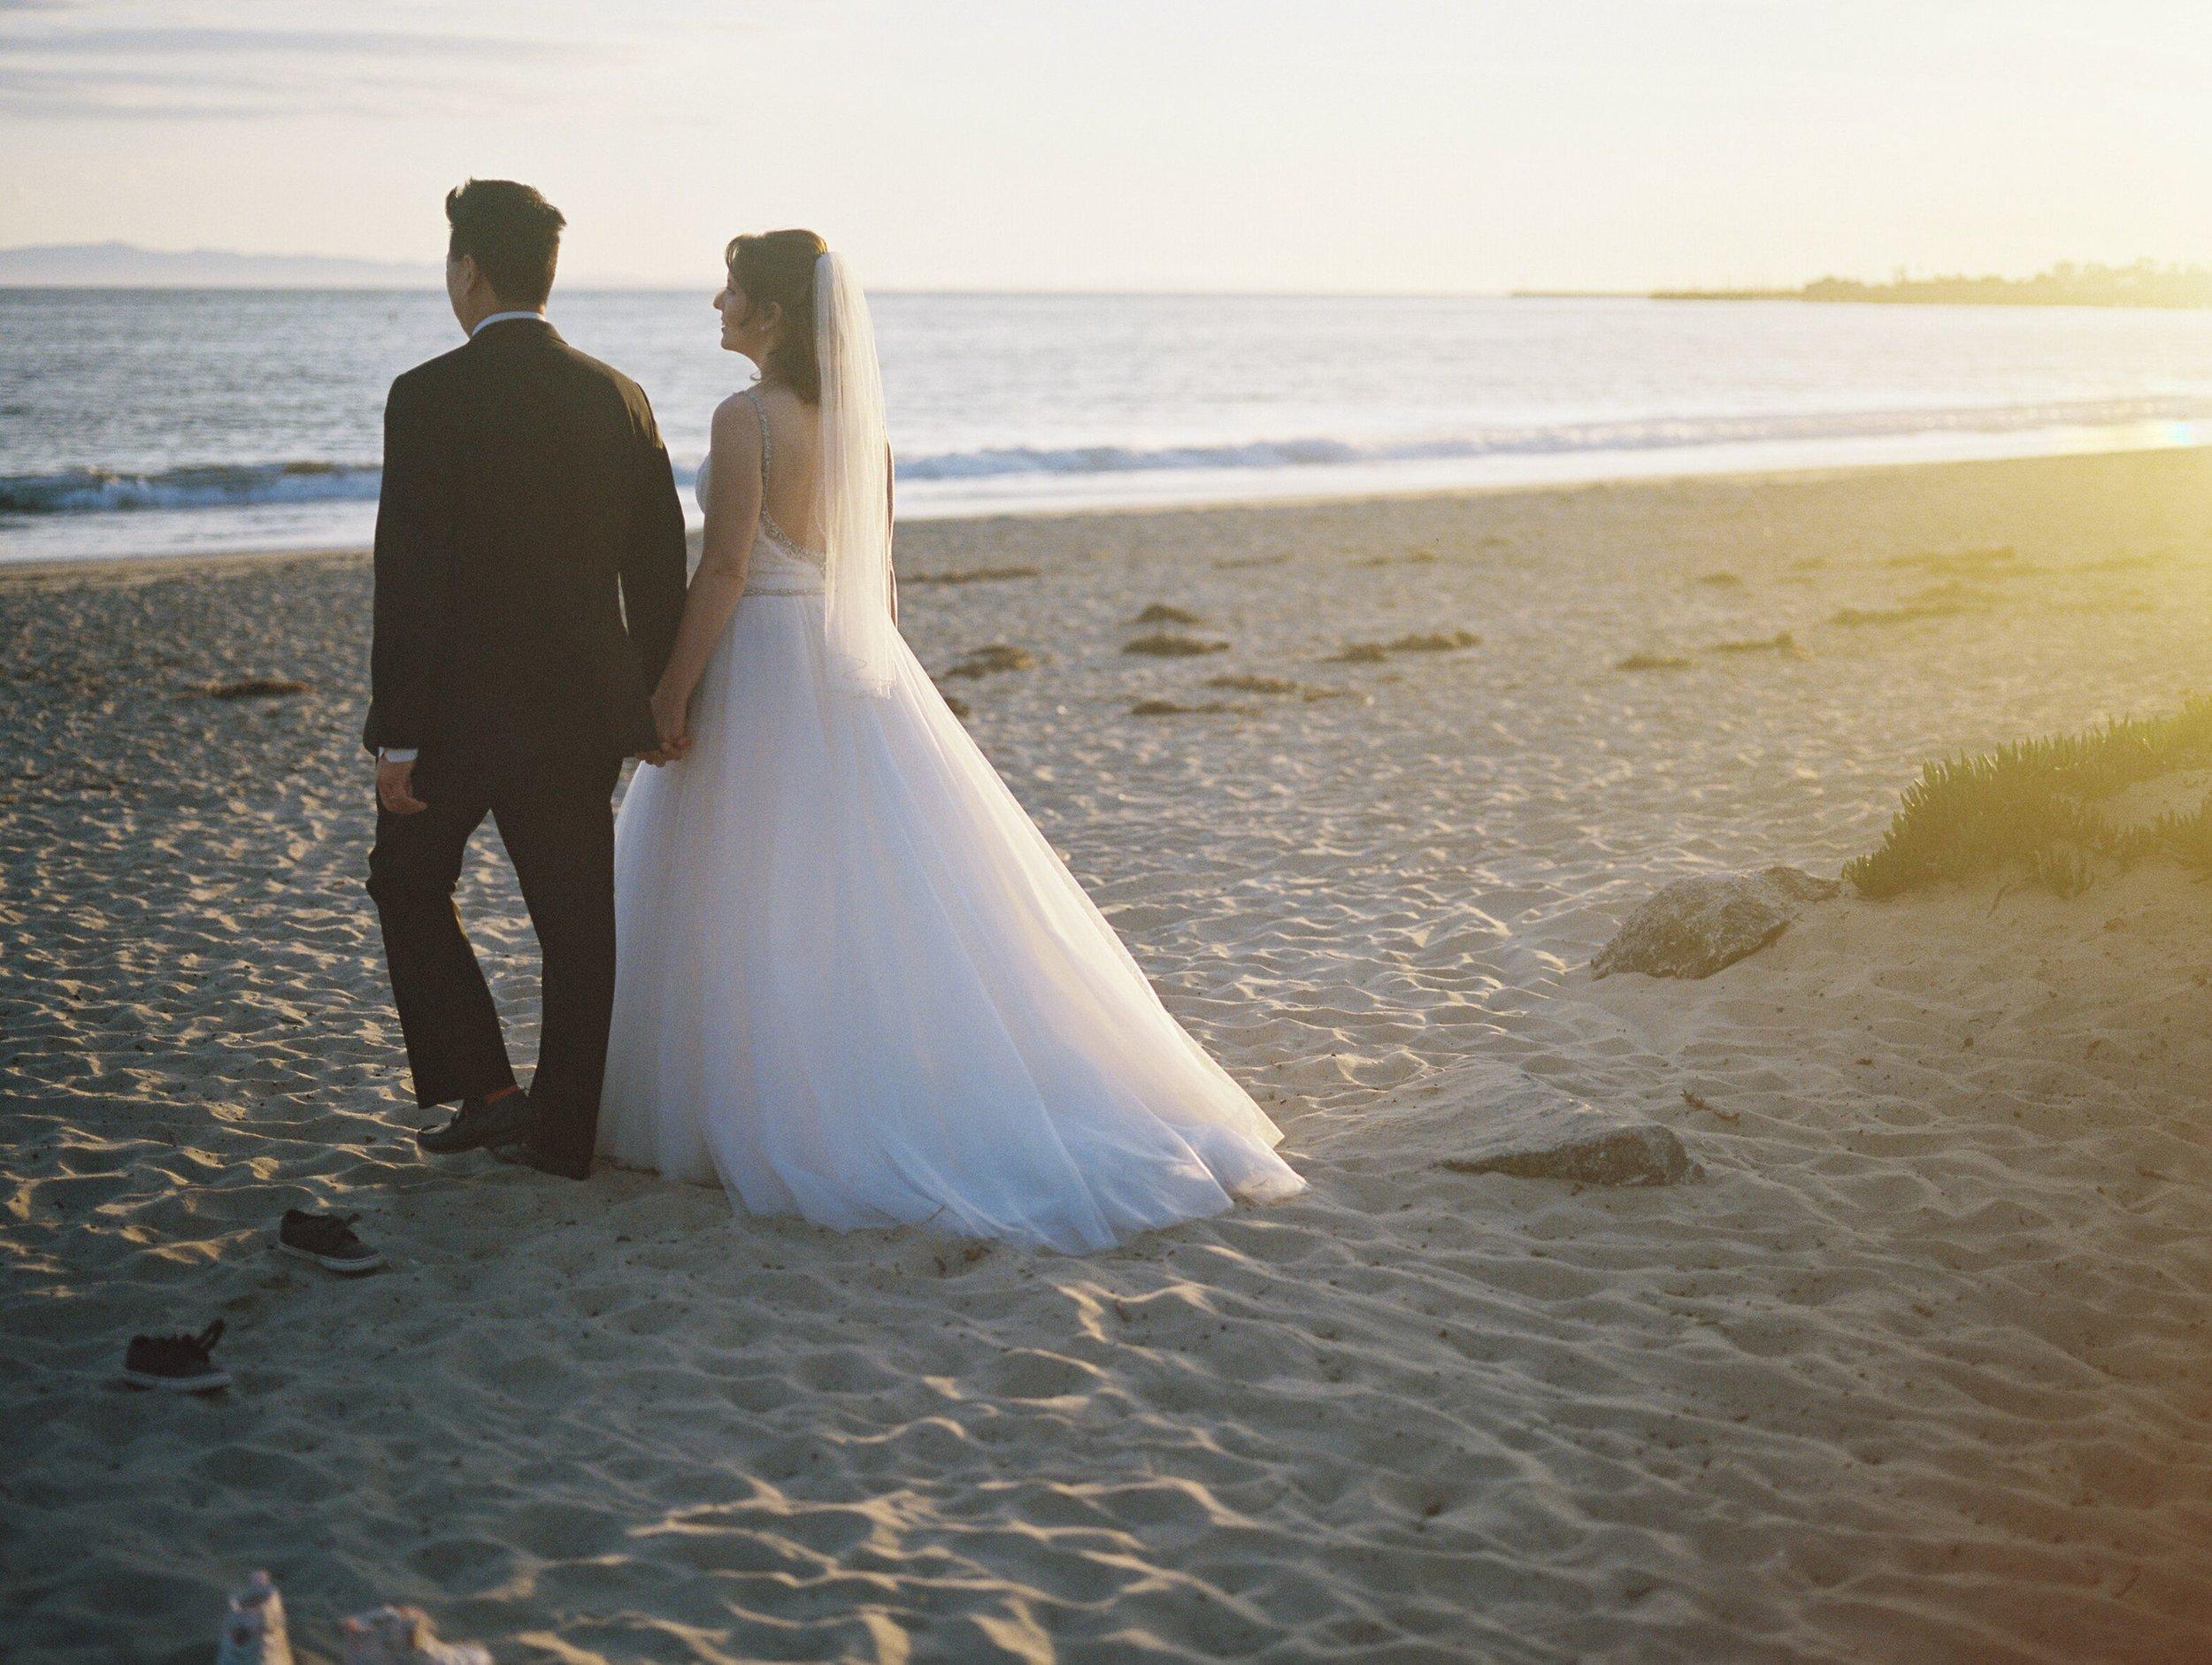 www.santabarbawedding.com | Venue: Santa Barbara Courthouse | Photography: Ryanne Bee Photography | Officiant: Santa Barbara Classic Weddings | Bride and Groom Staring at the Sea